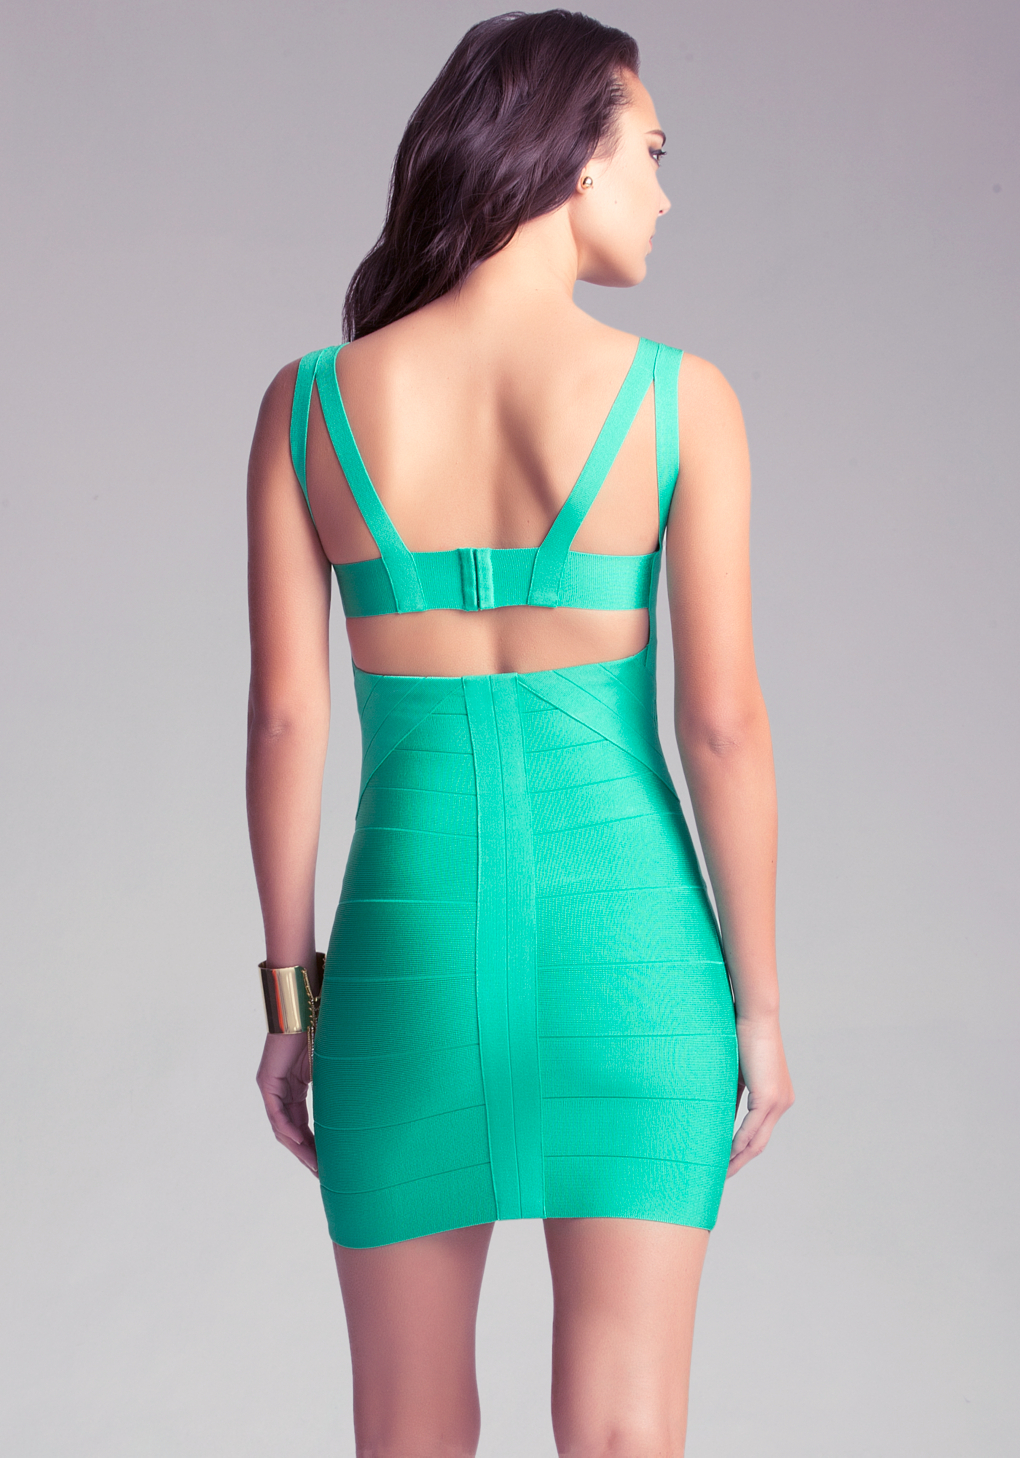 Bebe Strap Bandage Dress in Green - Lyst